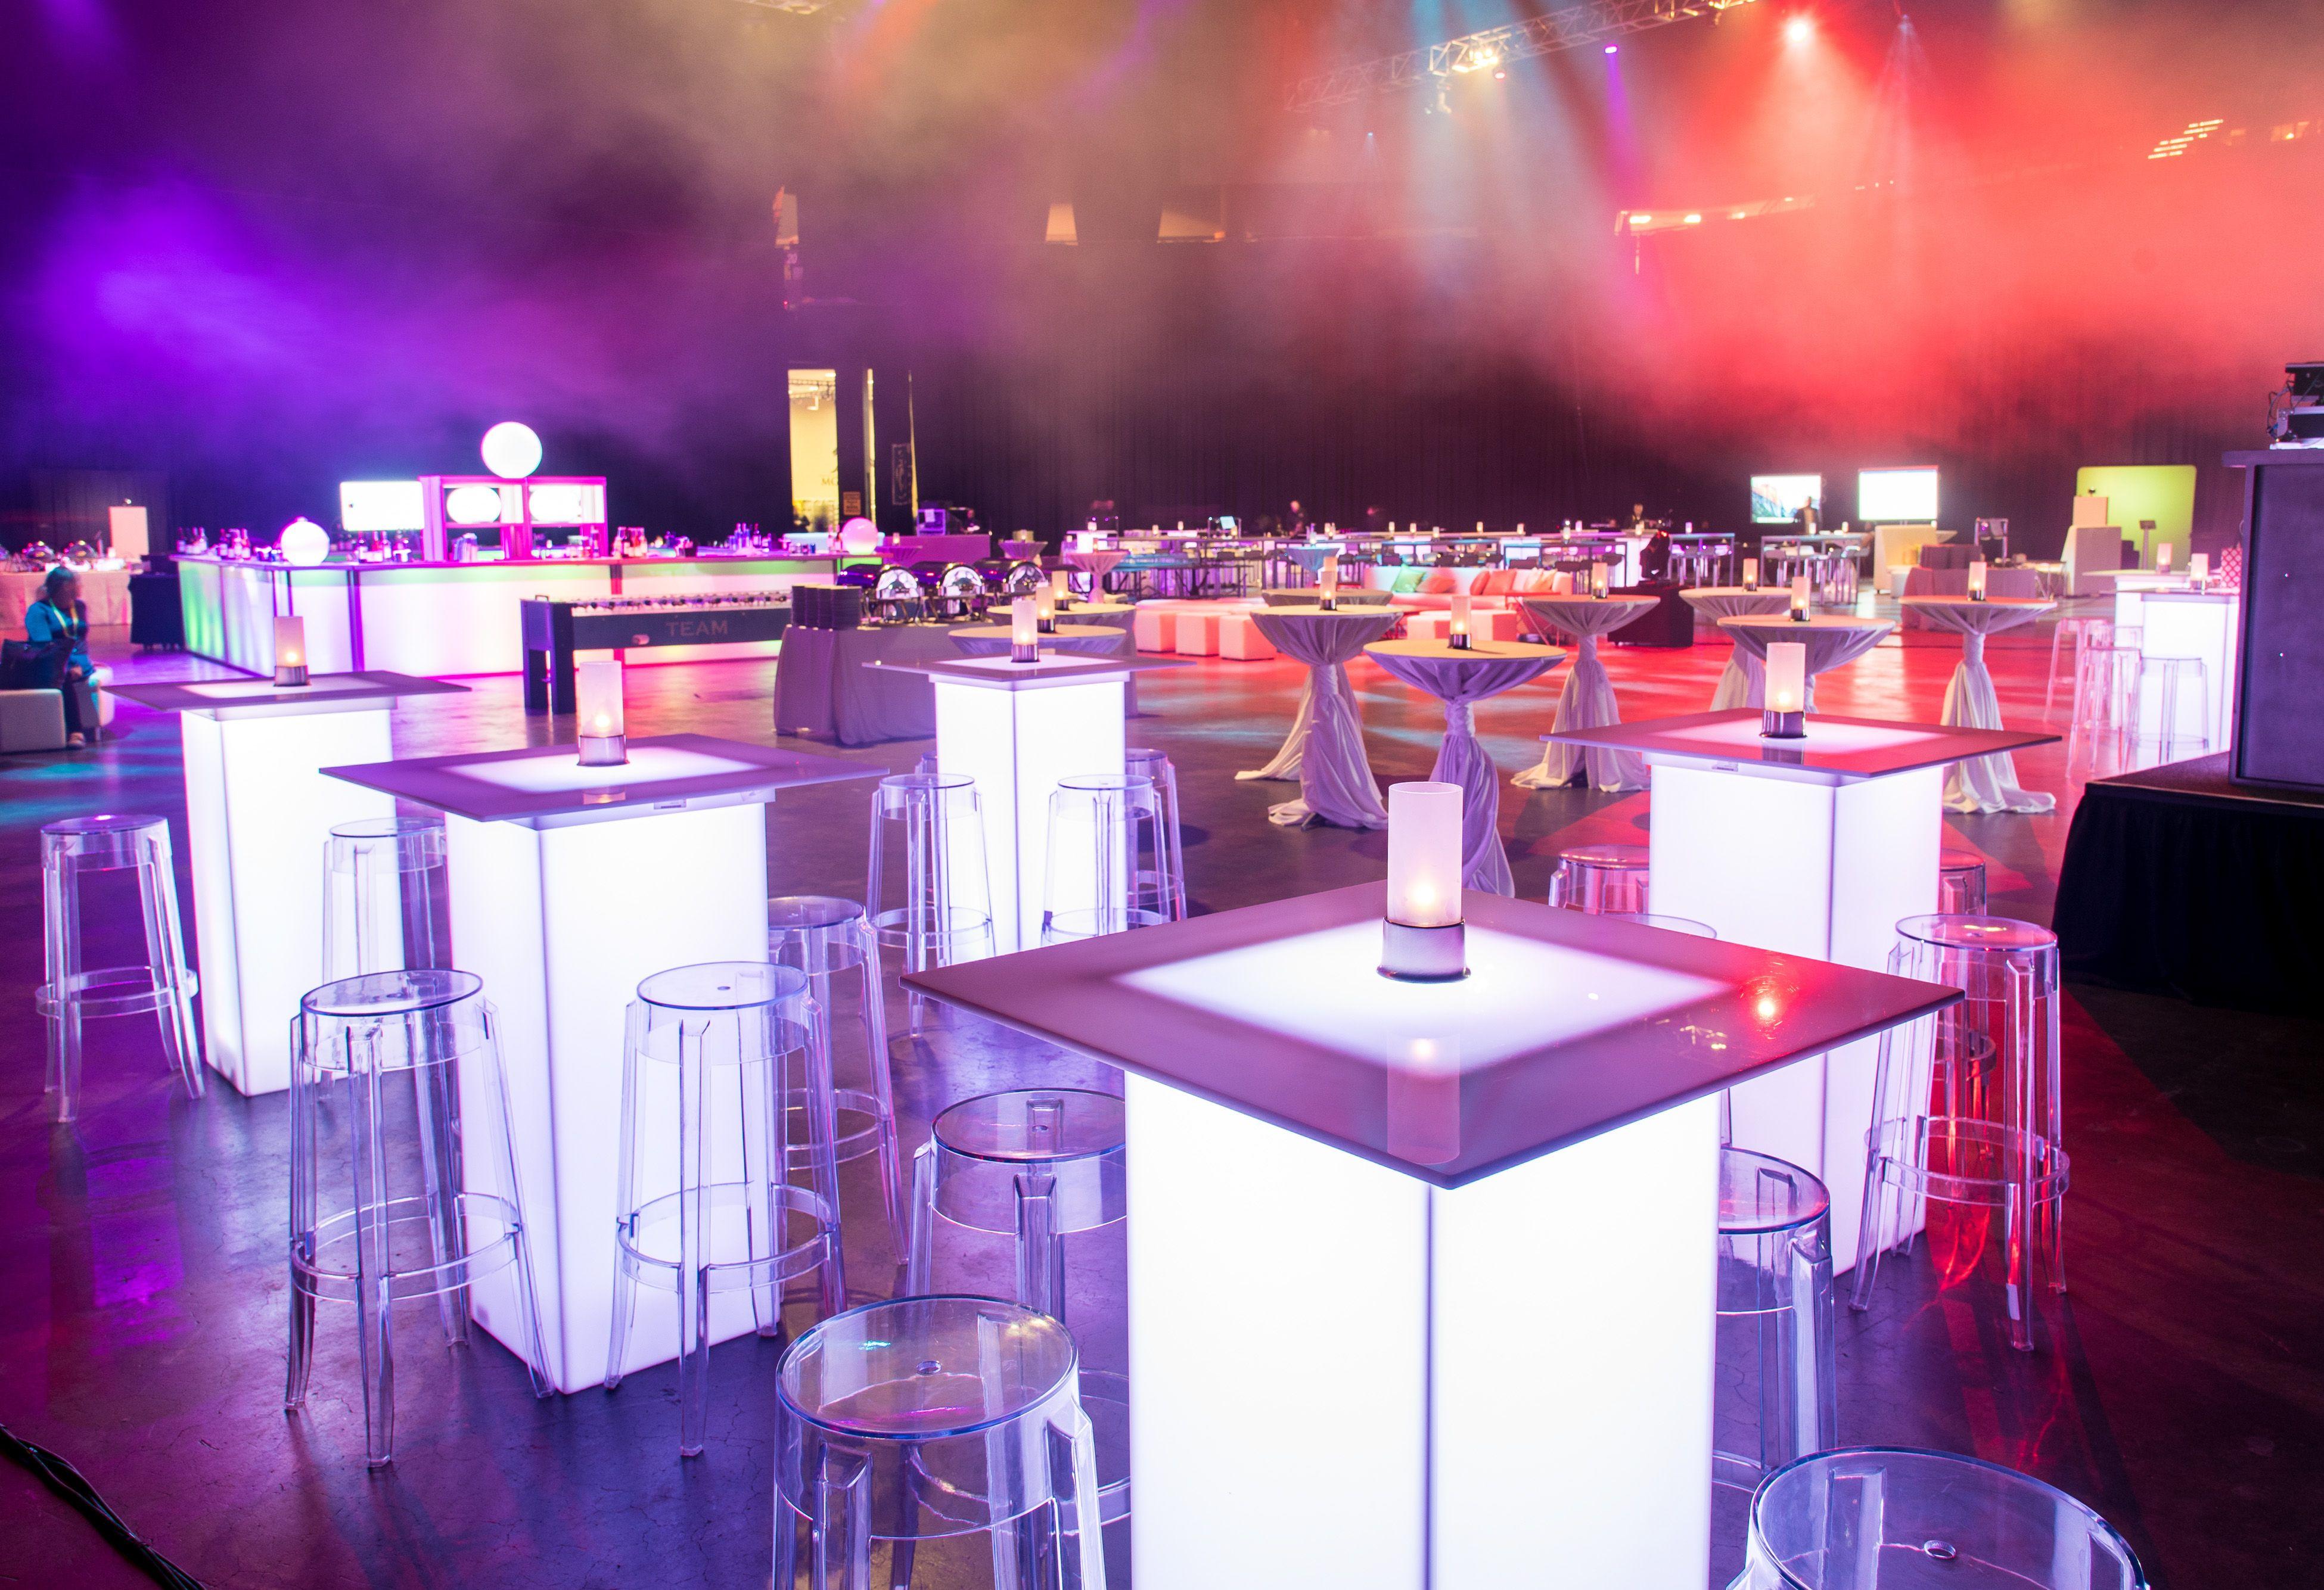 Favorite Corporate Event Venue Mgm Grand Garden Arena In Las Vegas Mgm Grand Garden Arena Corporate Events Mgm